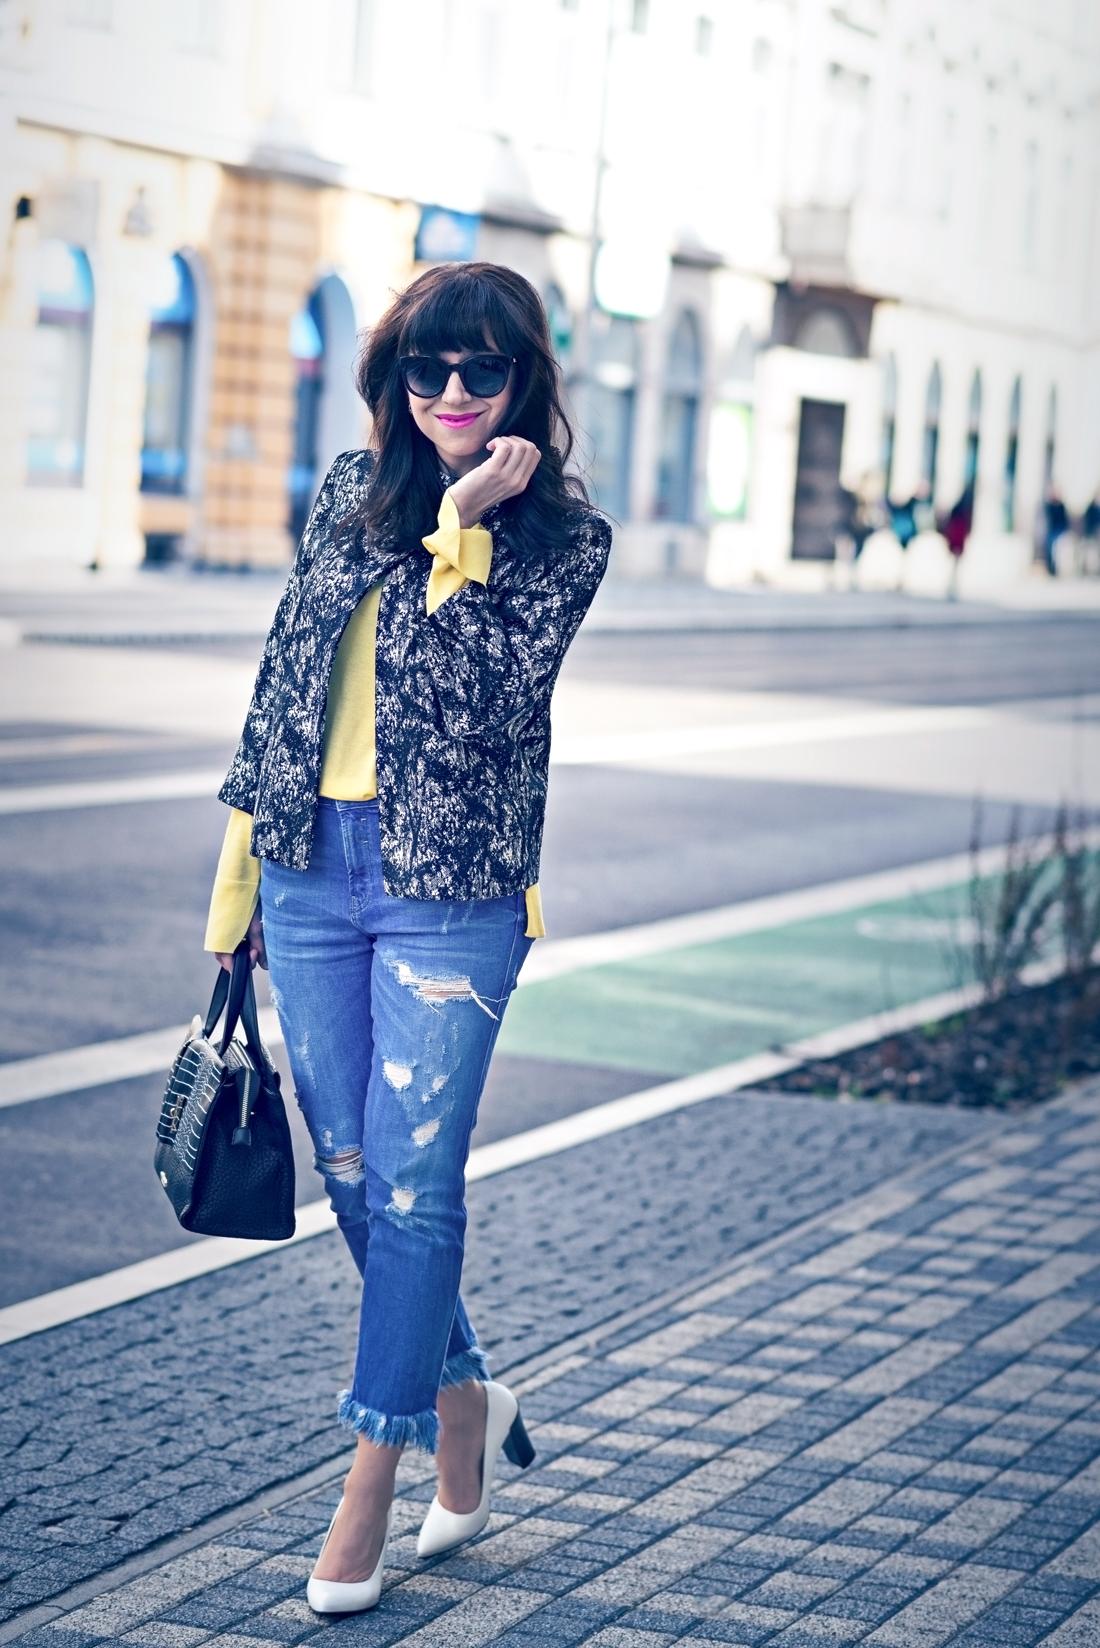 Podľa čoho spoznáte nákupnú maniačku_Katharine-fashion is beautiful_Blog 6_Tuliphousehotel_Džínsy Zara_Biele lodičky Kati_Okuliare Misteroptic_Katarína Jakubčová_Fashion blogger